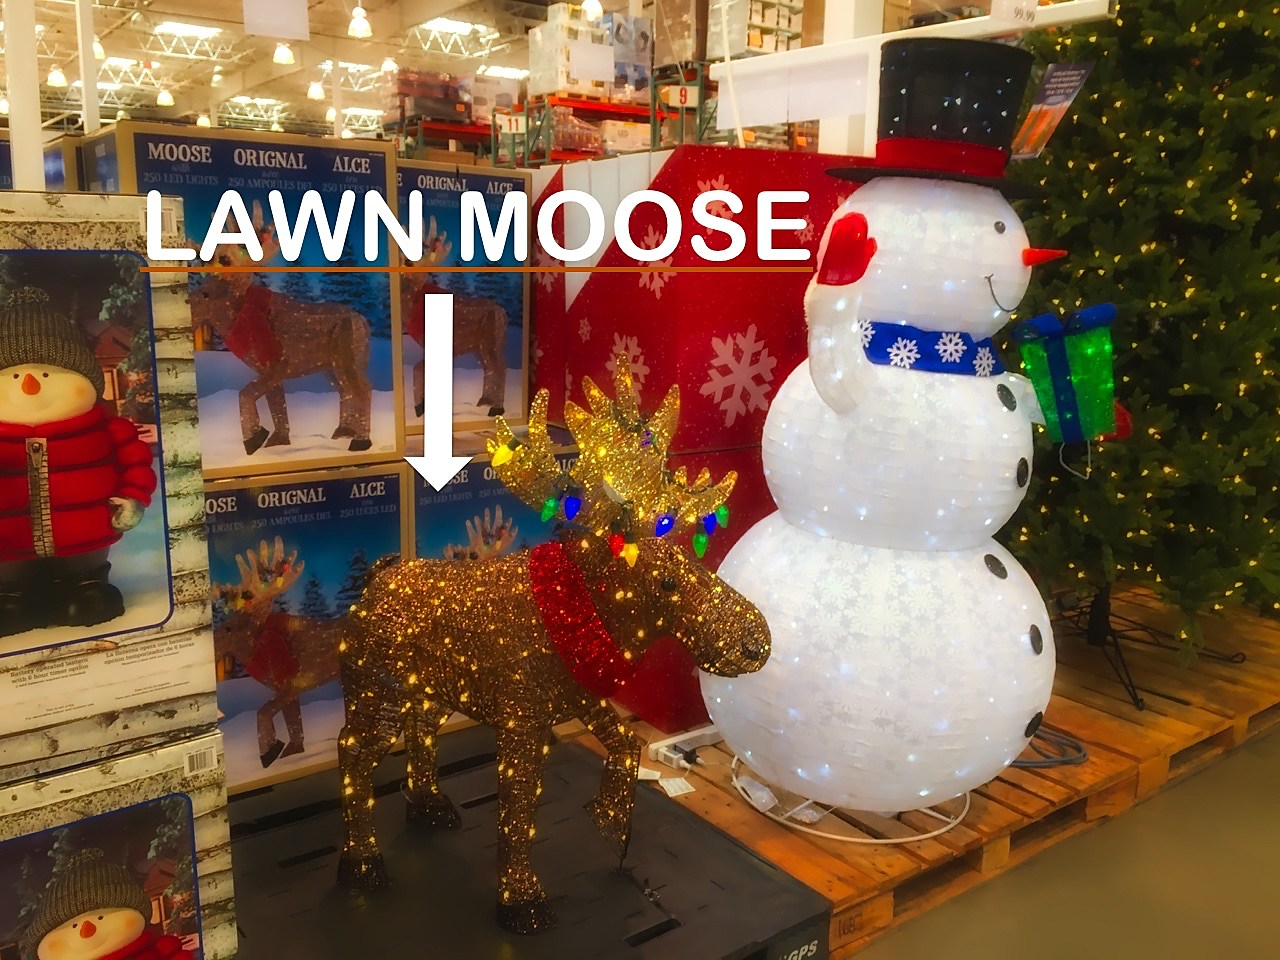 Lawn Moose